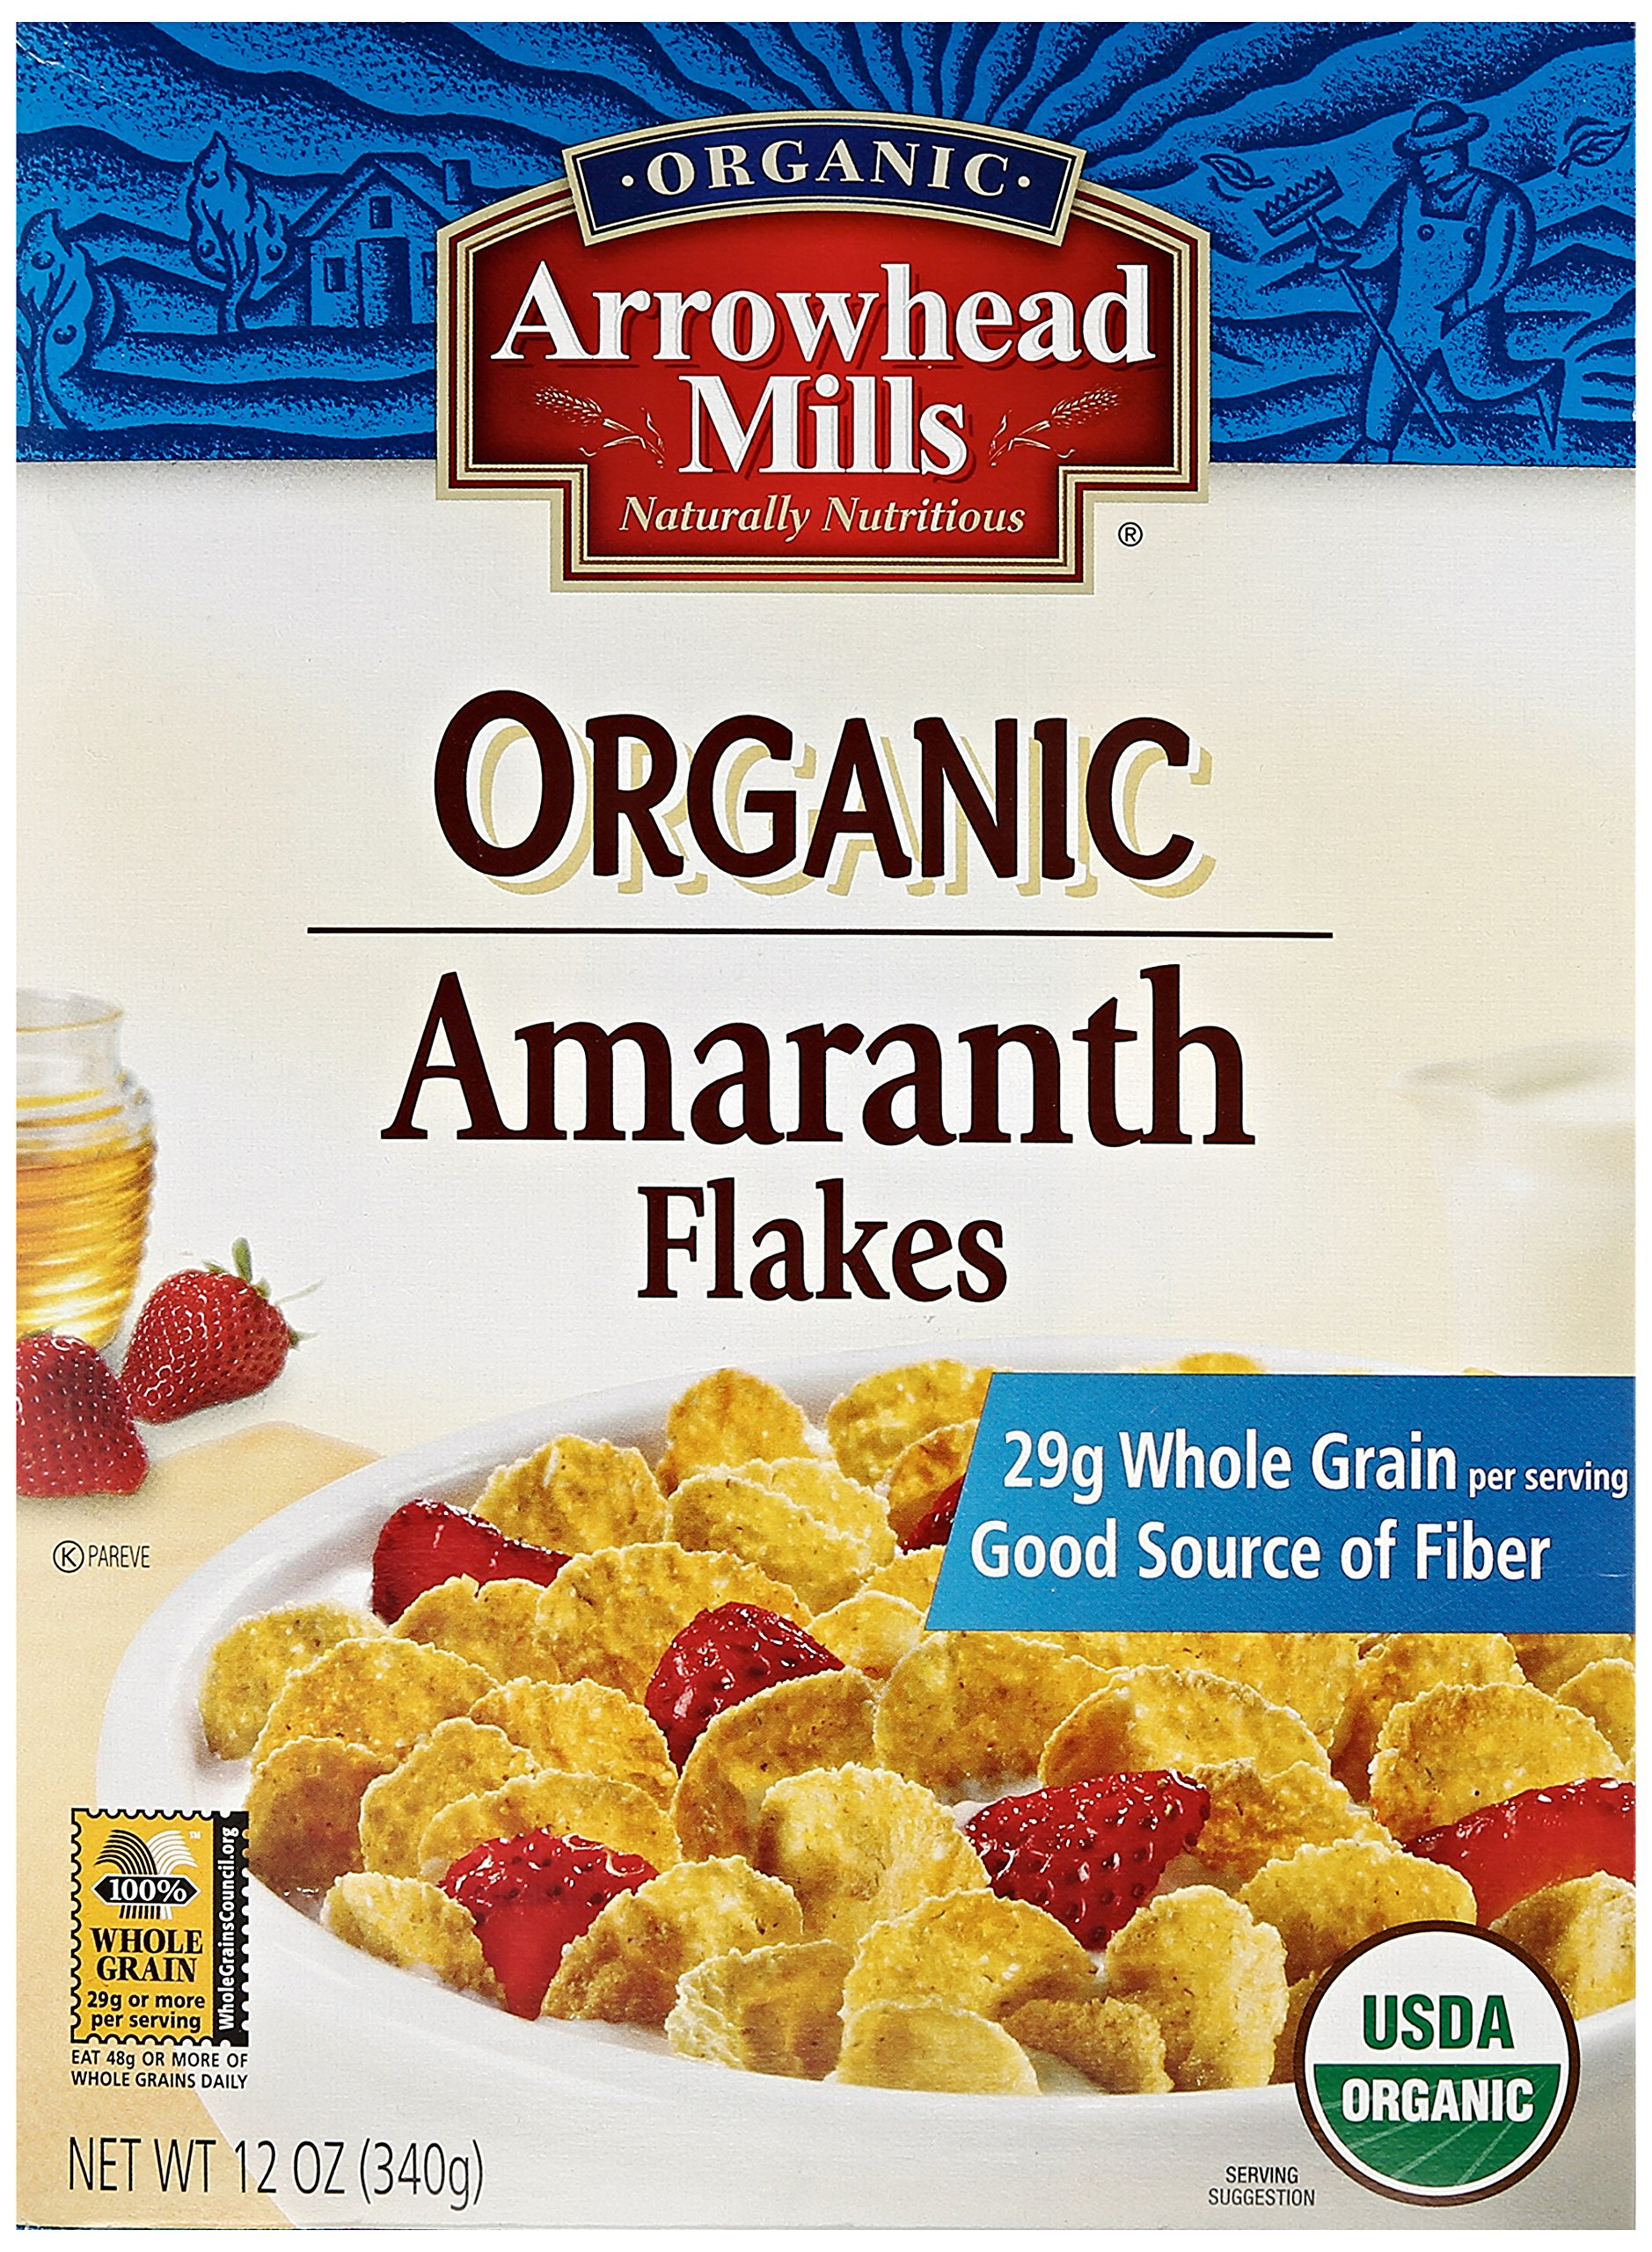 Arrowhead Mills Organic Cereal, Amaranth Flakes, 12 oz.